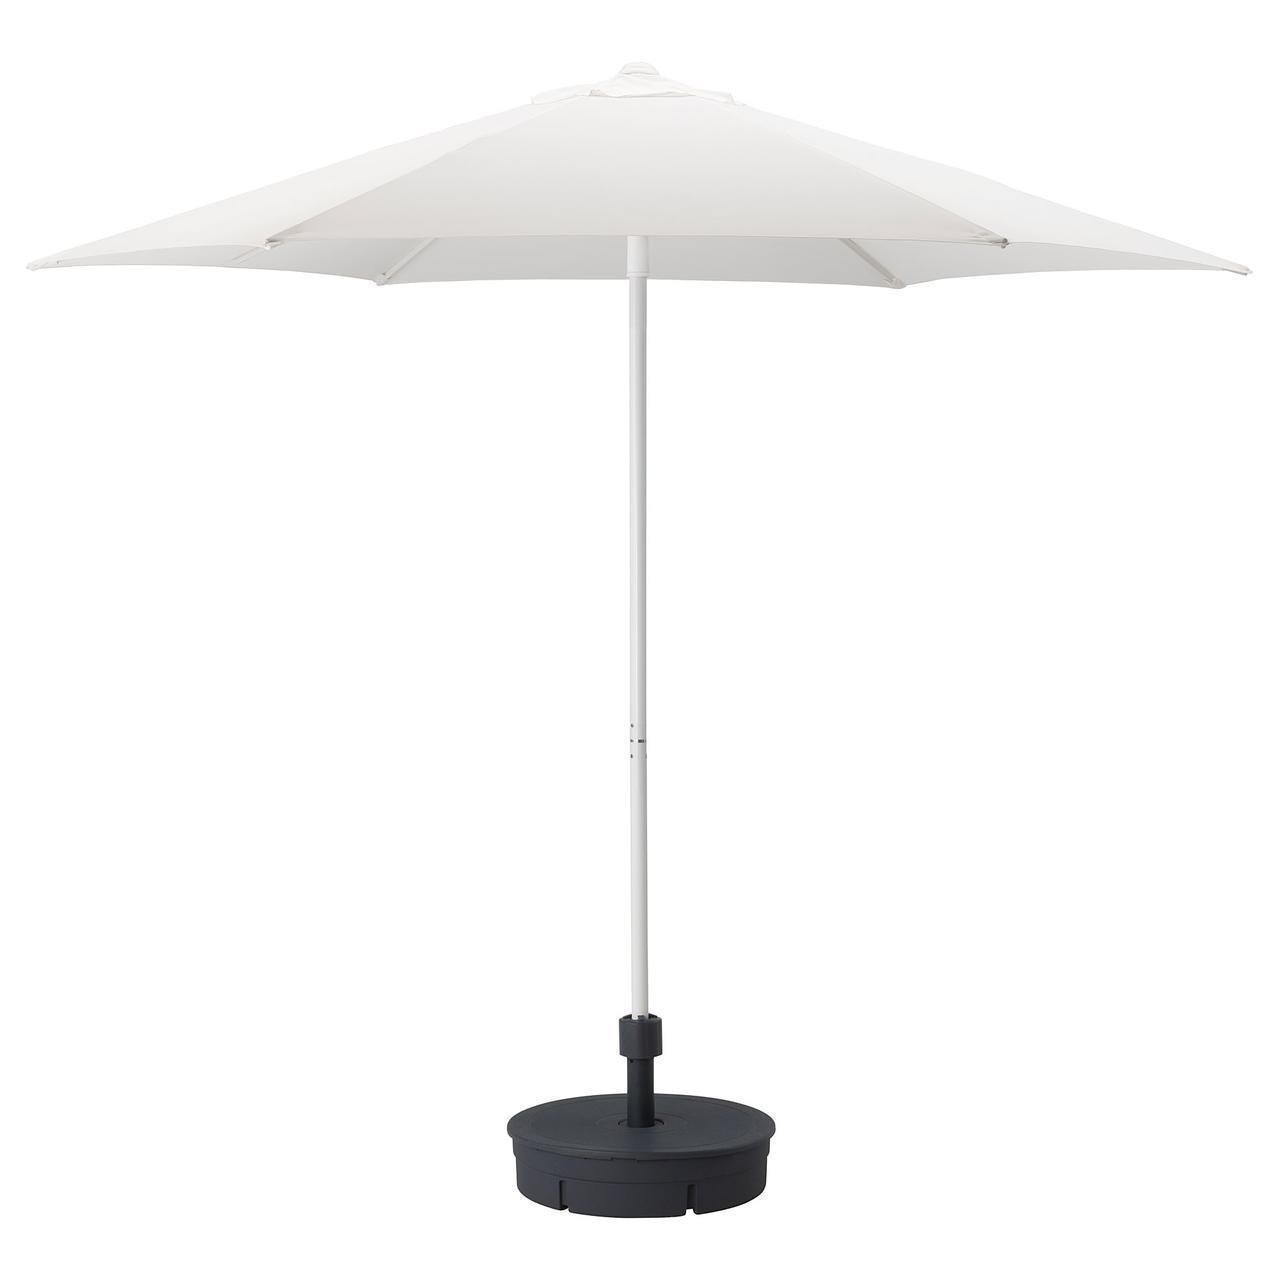 IKEA HOGON Зонт с подставкой, белый, подставка темно-серый  (392.858.13)